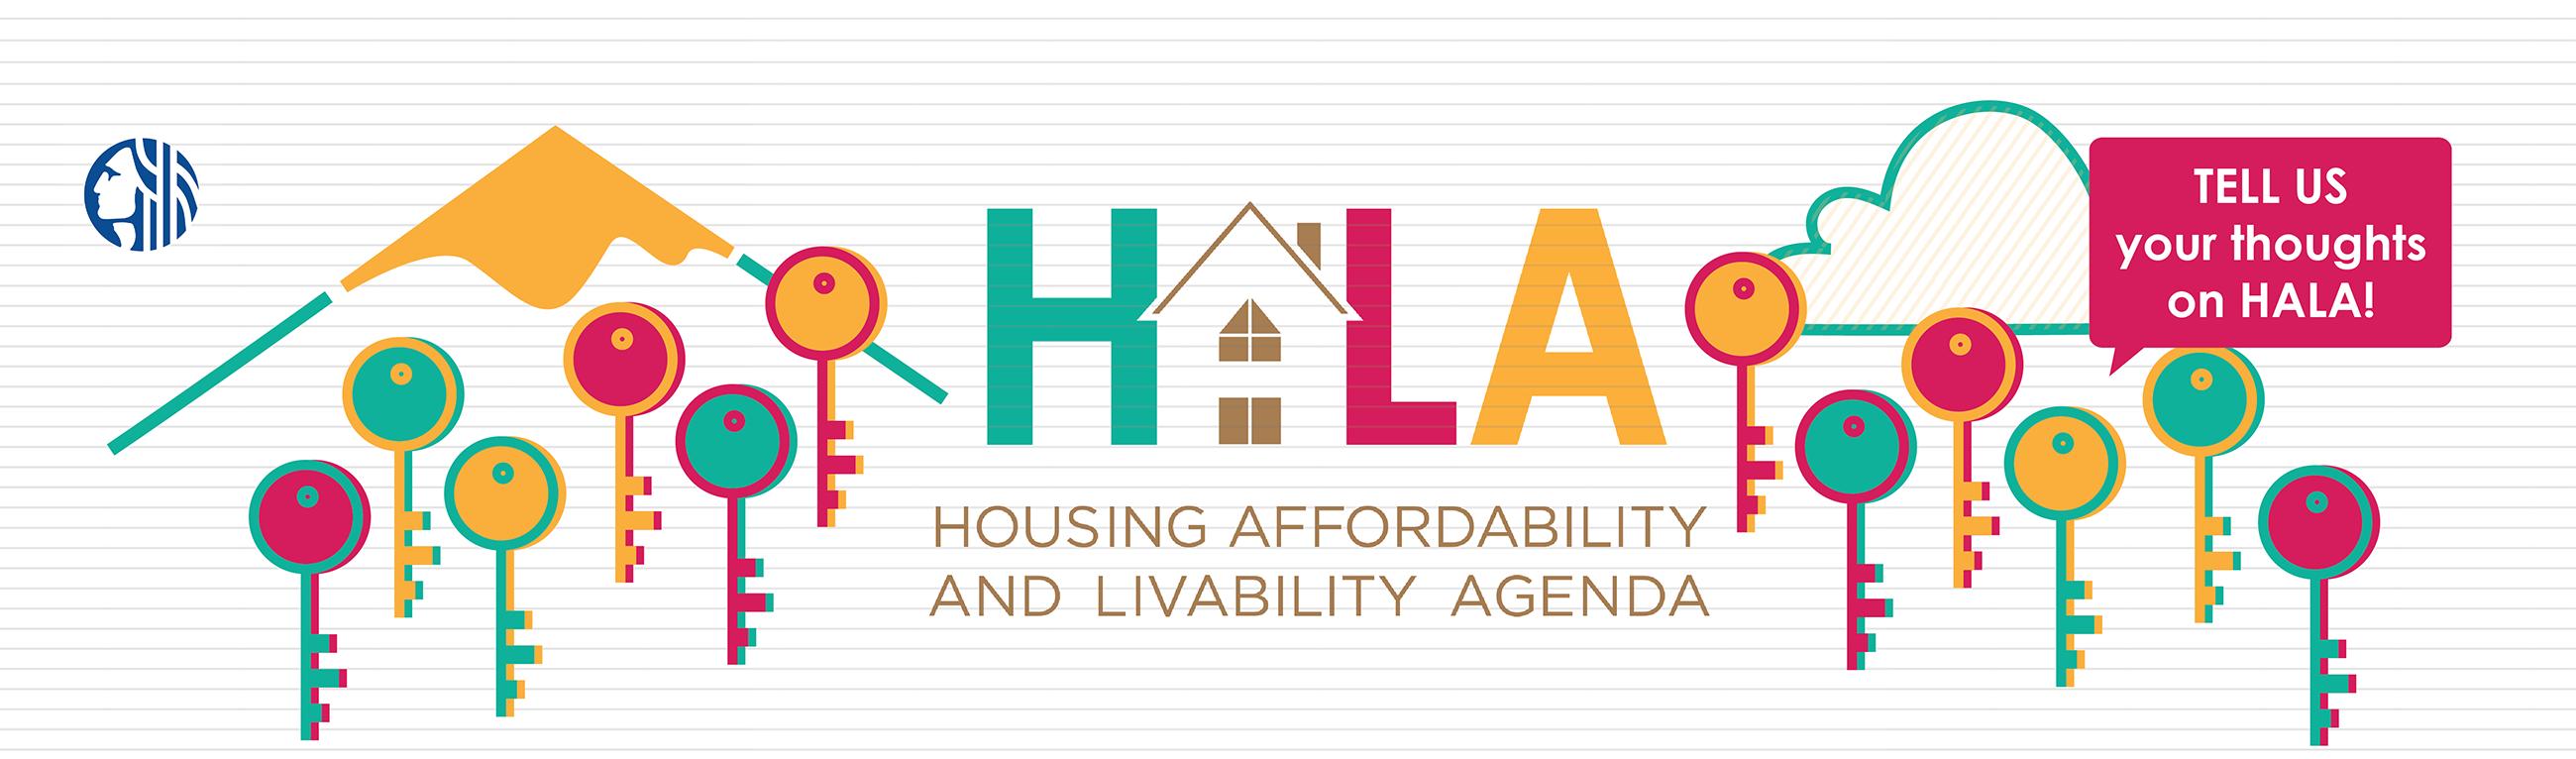 Seattle Housing Affordability and Livability Agenda